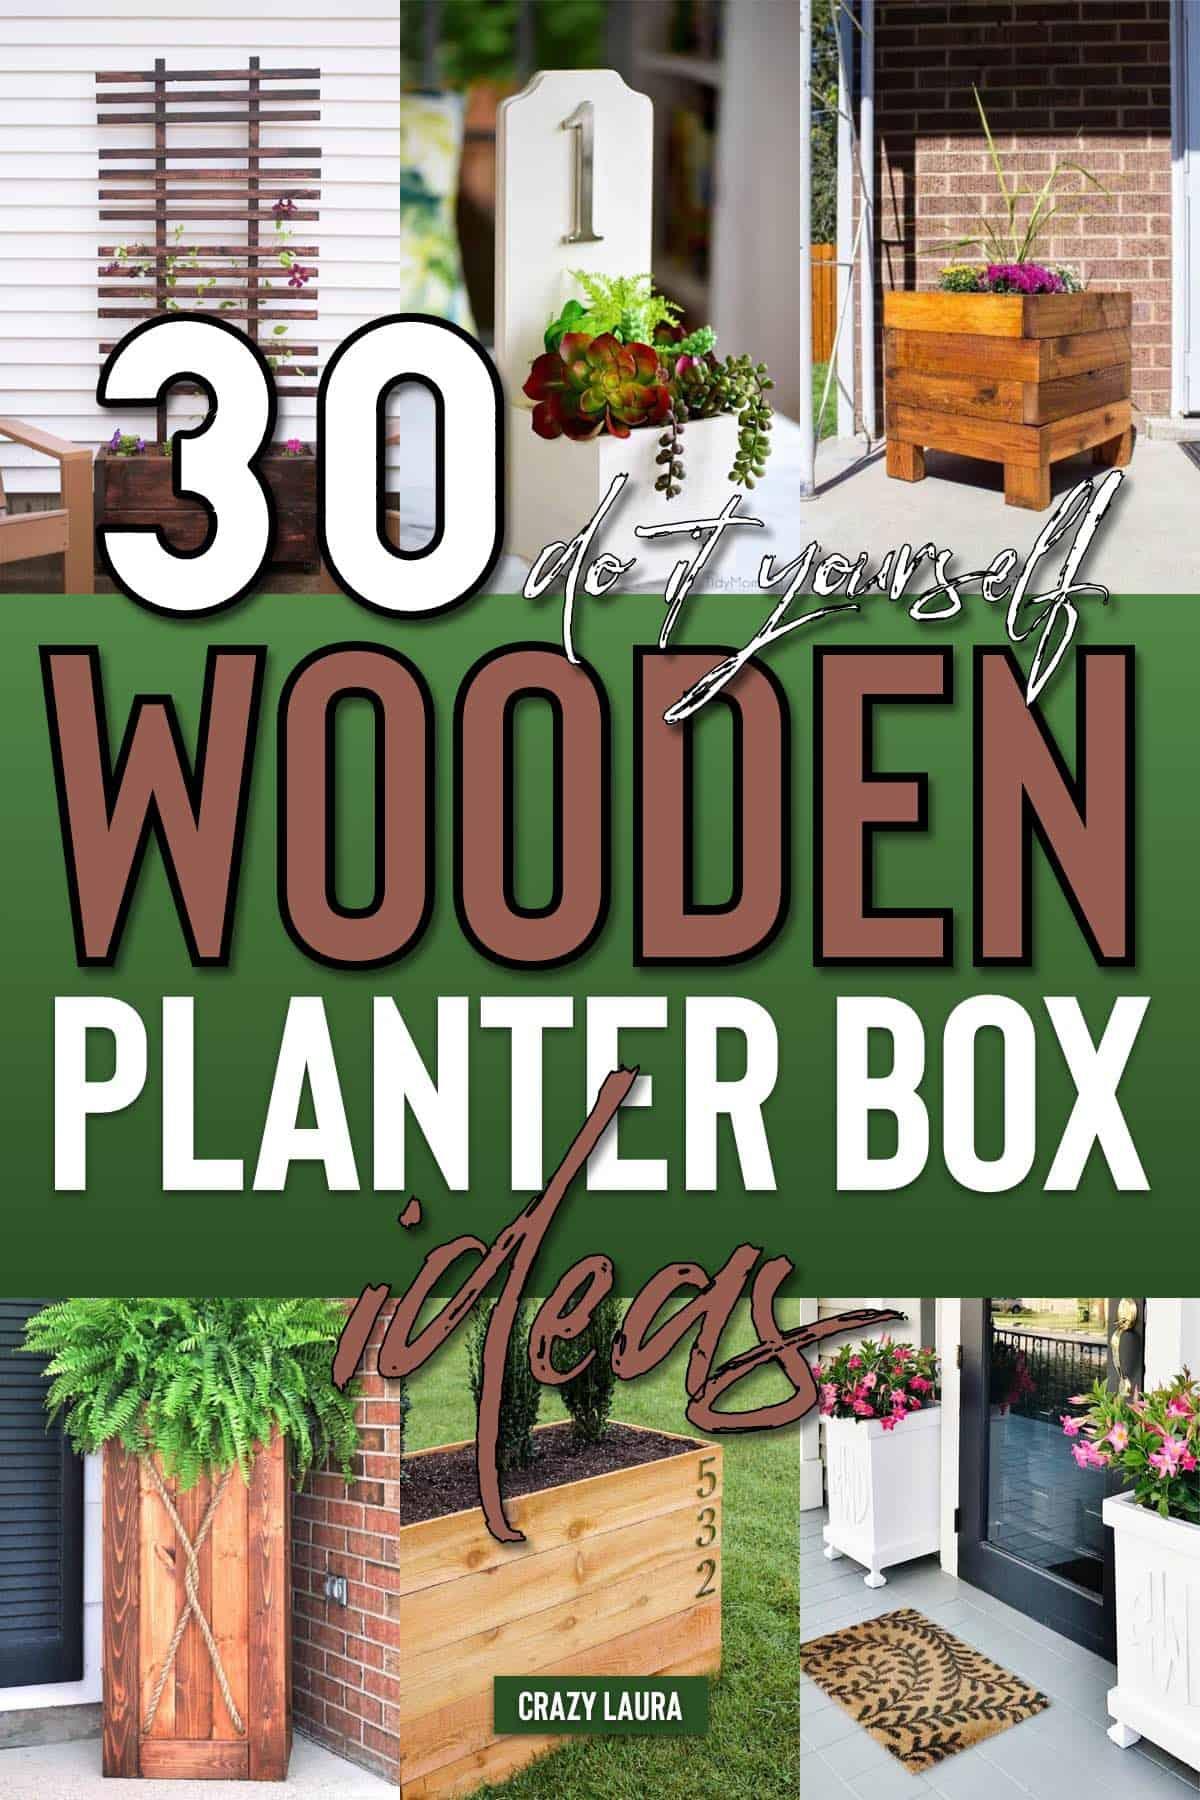 planter box tutorial ideas